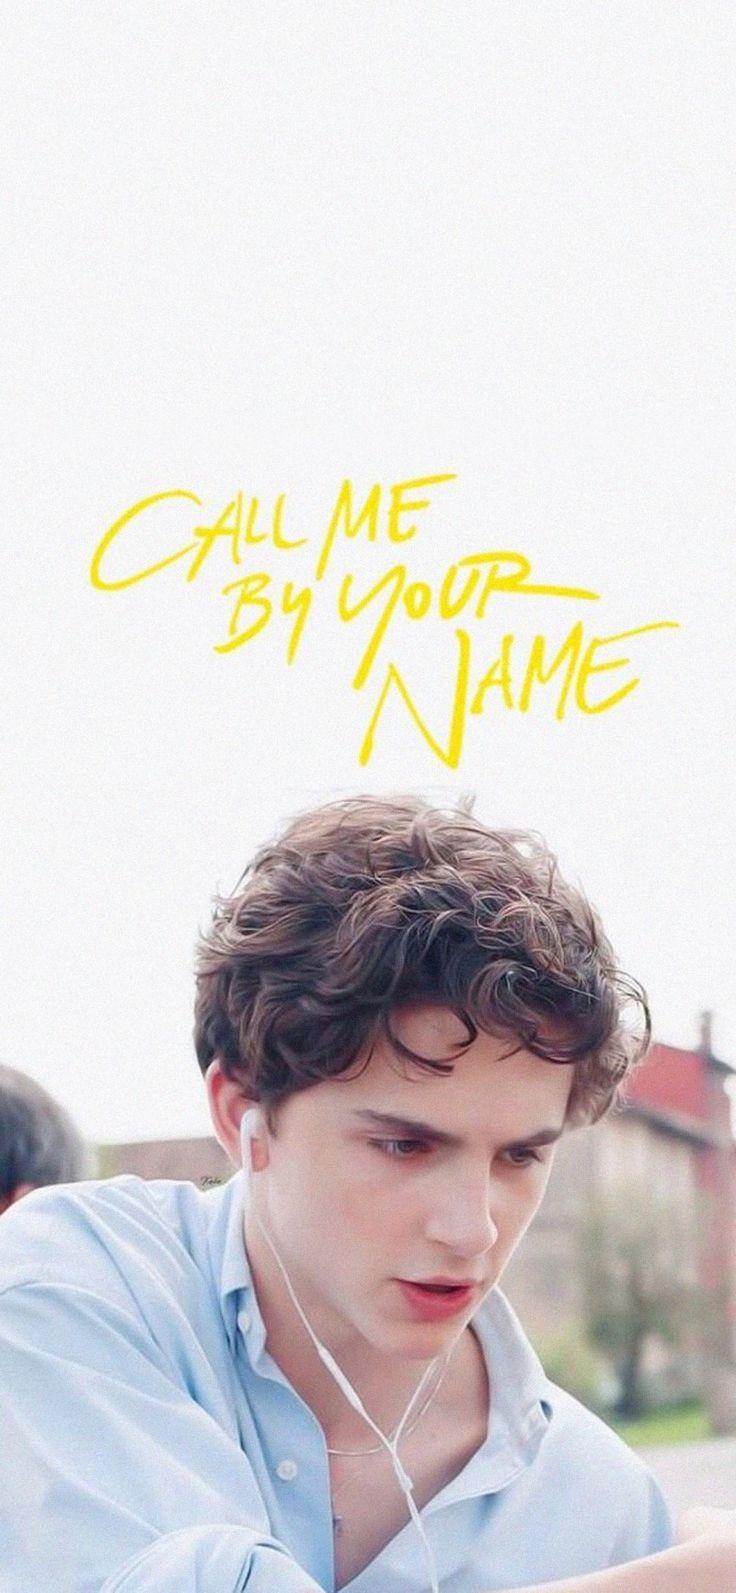 Timothee Chalamet Call Me By Your Name Timothee Chalamet Fondos De Cine Fondos De Peliculas Chicos Lindos Tumblr